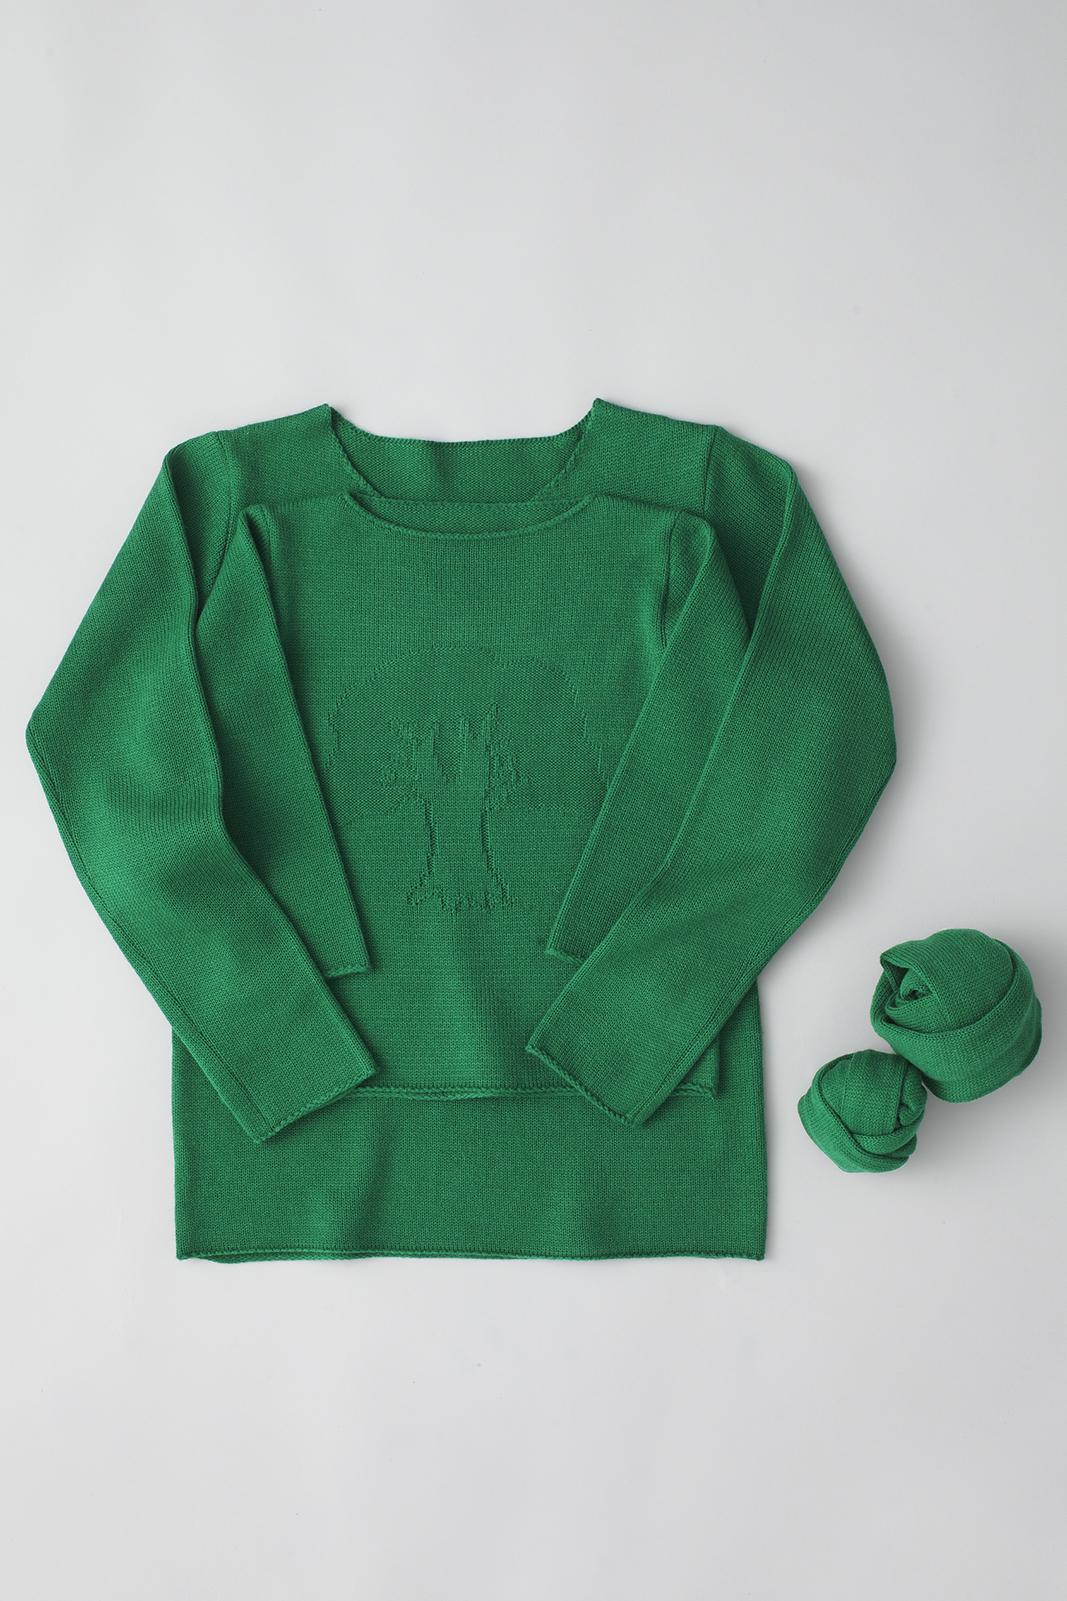 Camphor カンフル ニット knitwear kids こども 子供服 camphorsweater